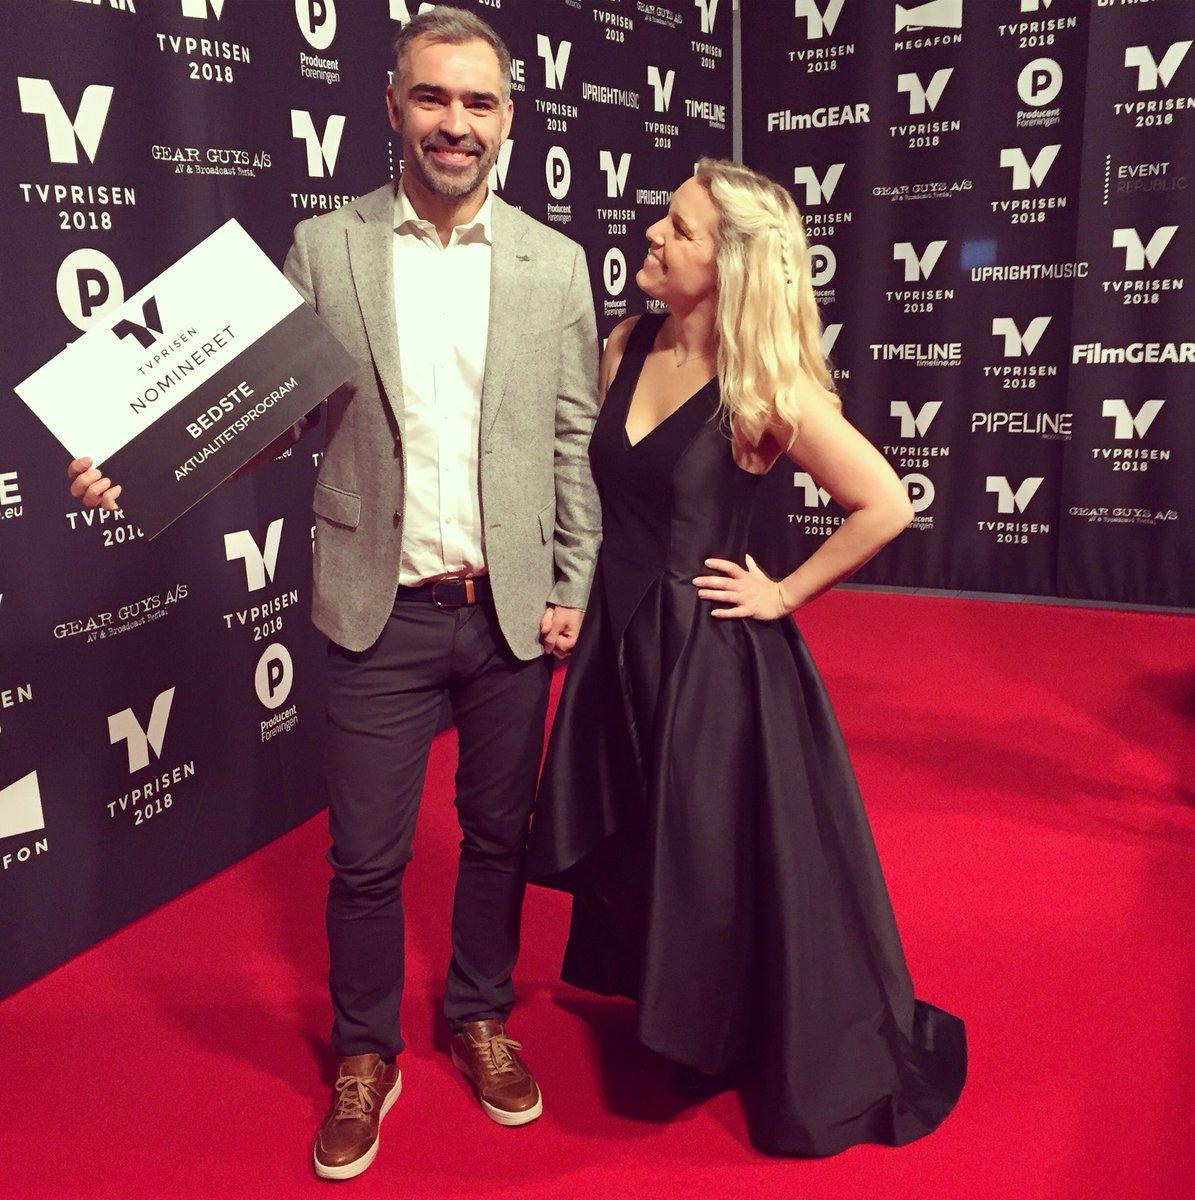 Uzivatel Carina Bergfeldt Na Twitteru Han Ar Nominerad Jag Ar Stolt Tvprisen2018